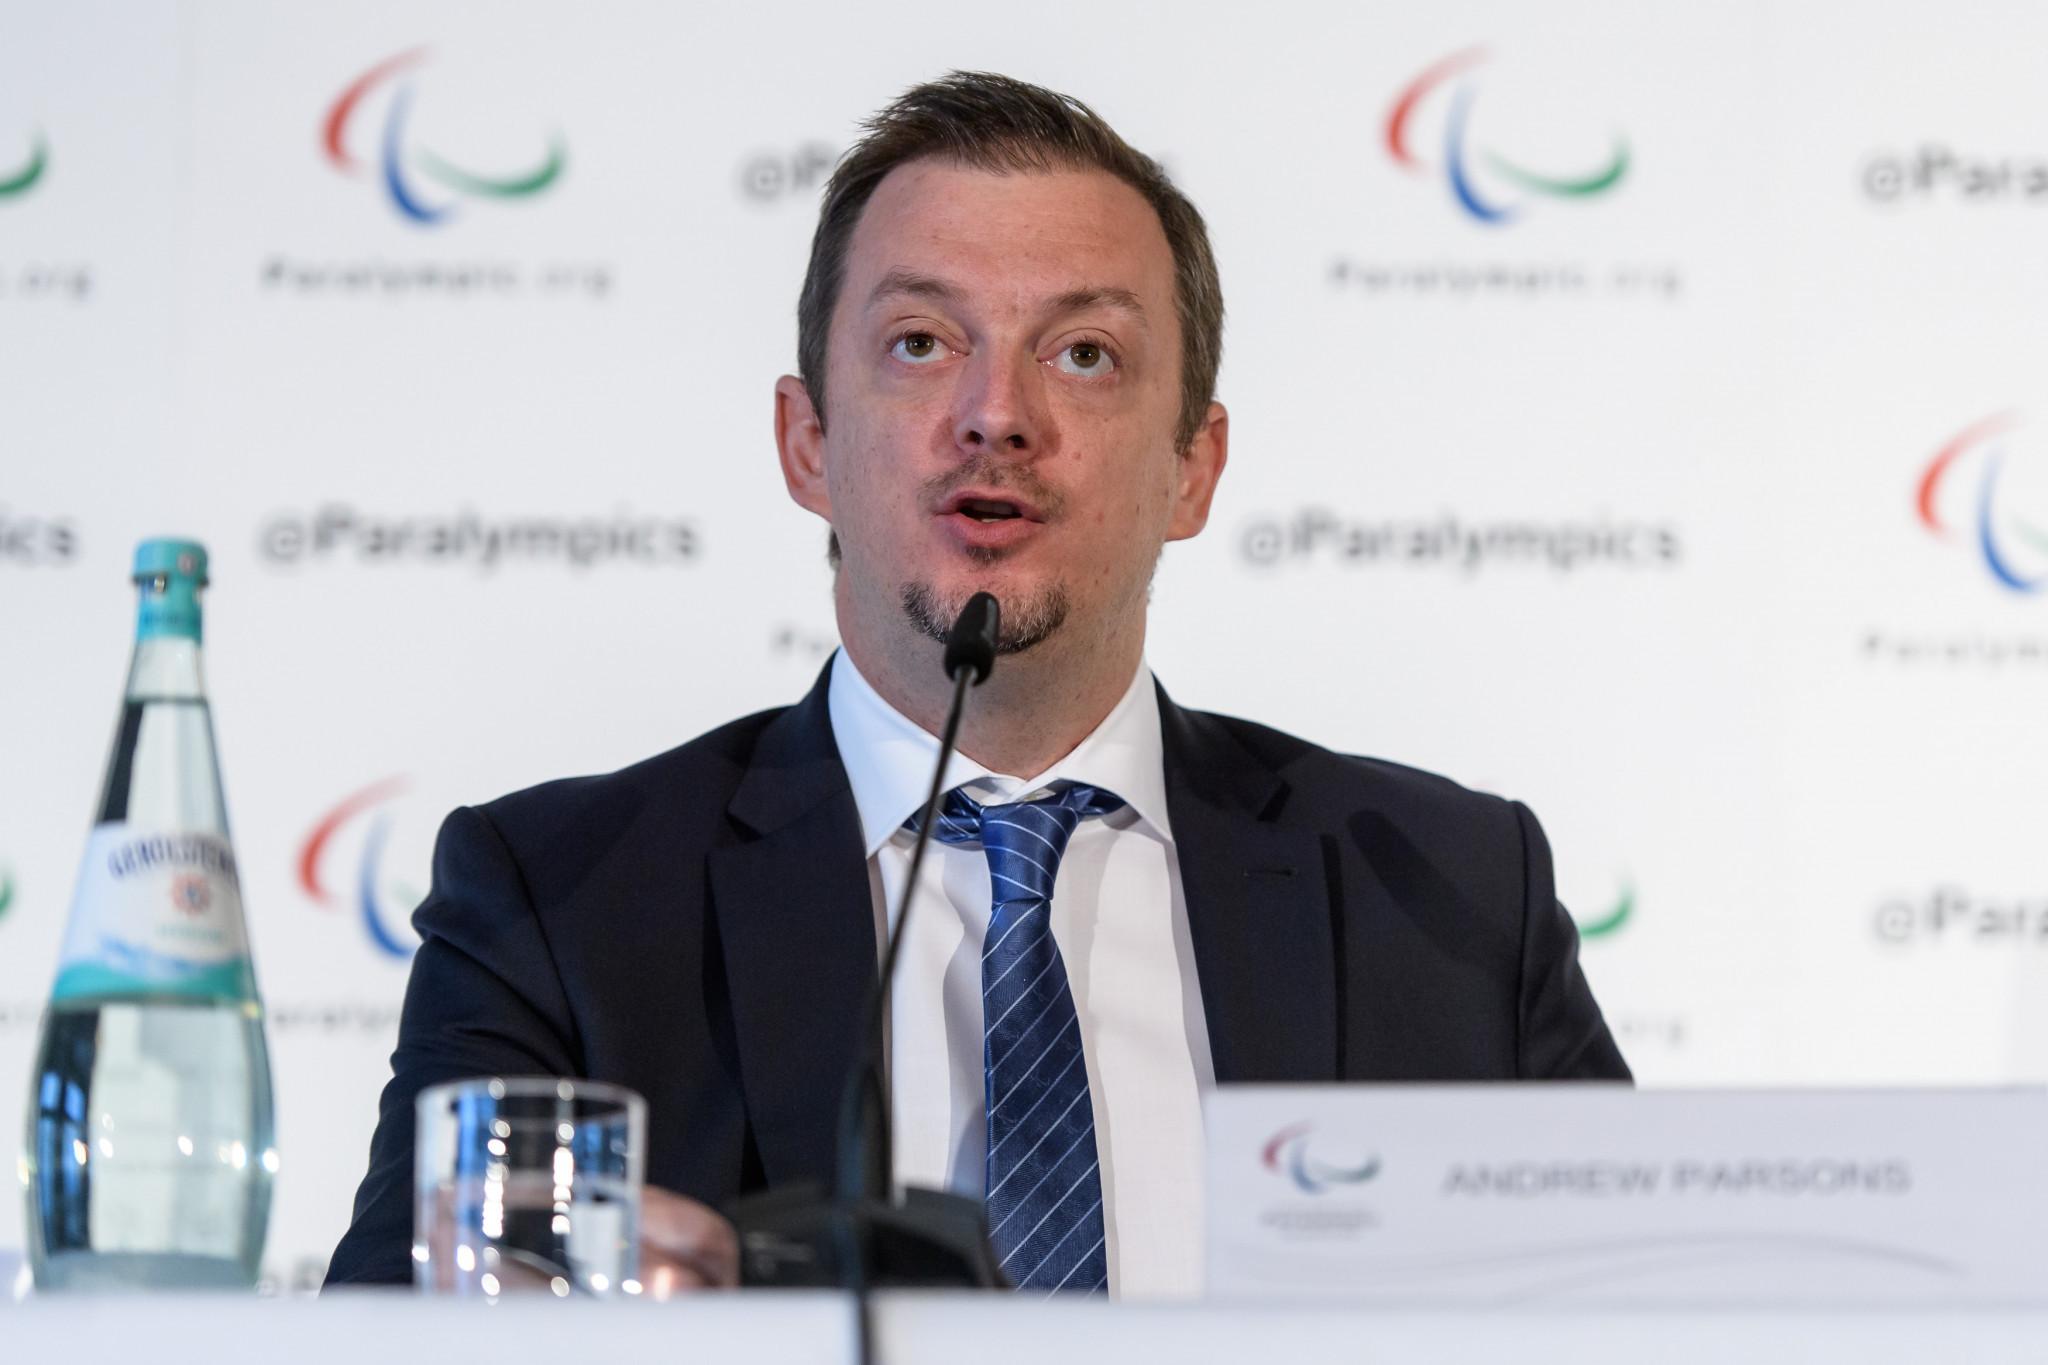 IPC President Parsons' praise for successful Milan Cortina 2026 Winter Paralympic Games bid